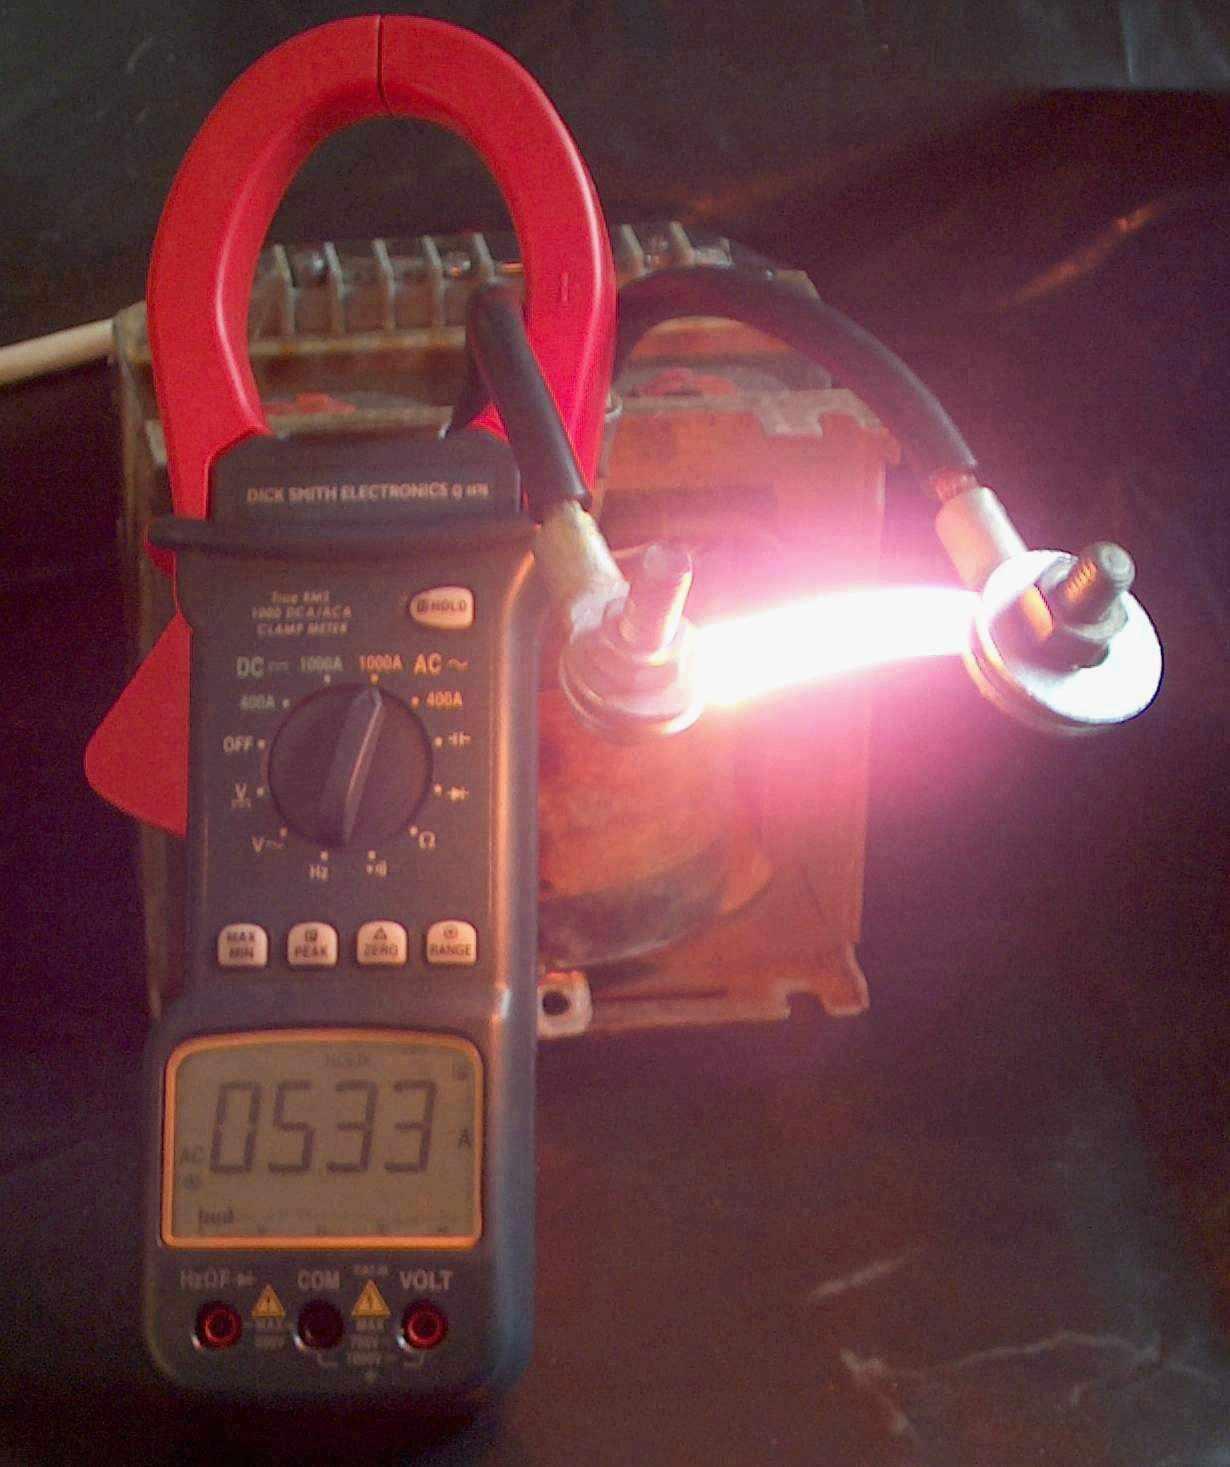 Low Voltage Power Homopolar Motor Explanation Electrical Measurement Click To Enlarge